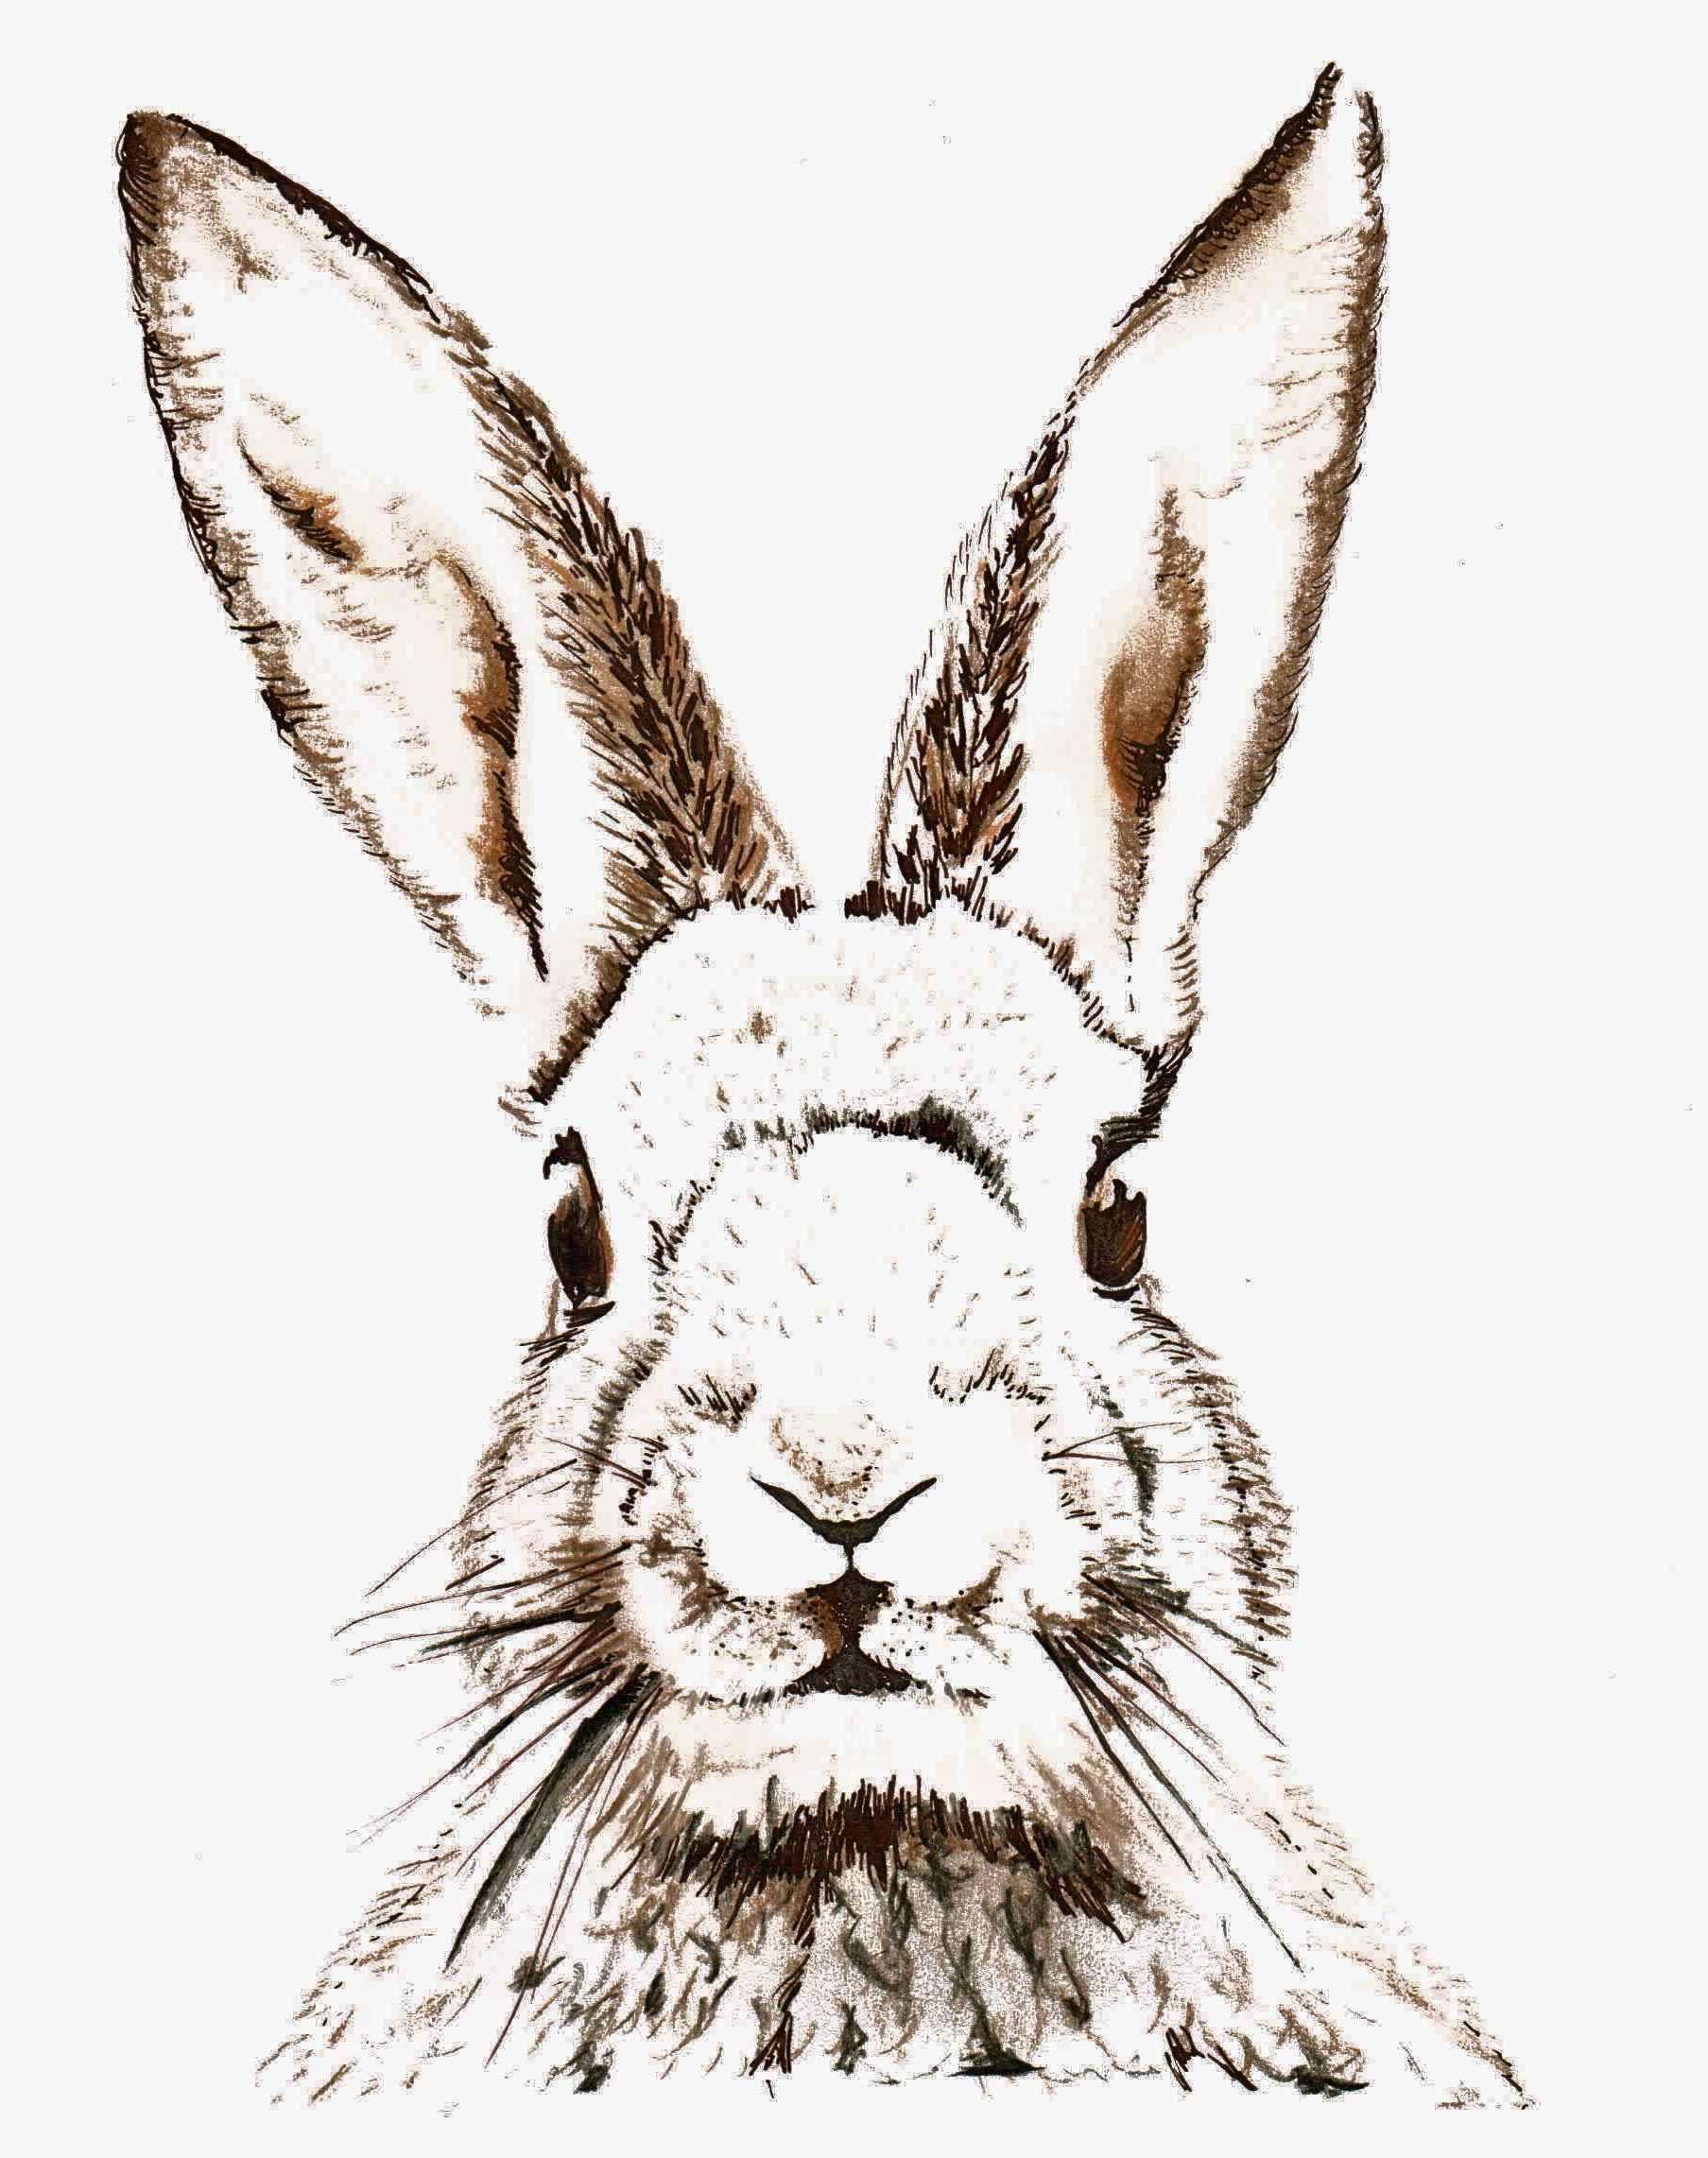 Free Easter Printable & Vintage Clip Art | Craftlady | Pinterest - Free Printable Vintage Easter Images